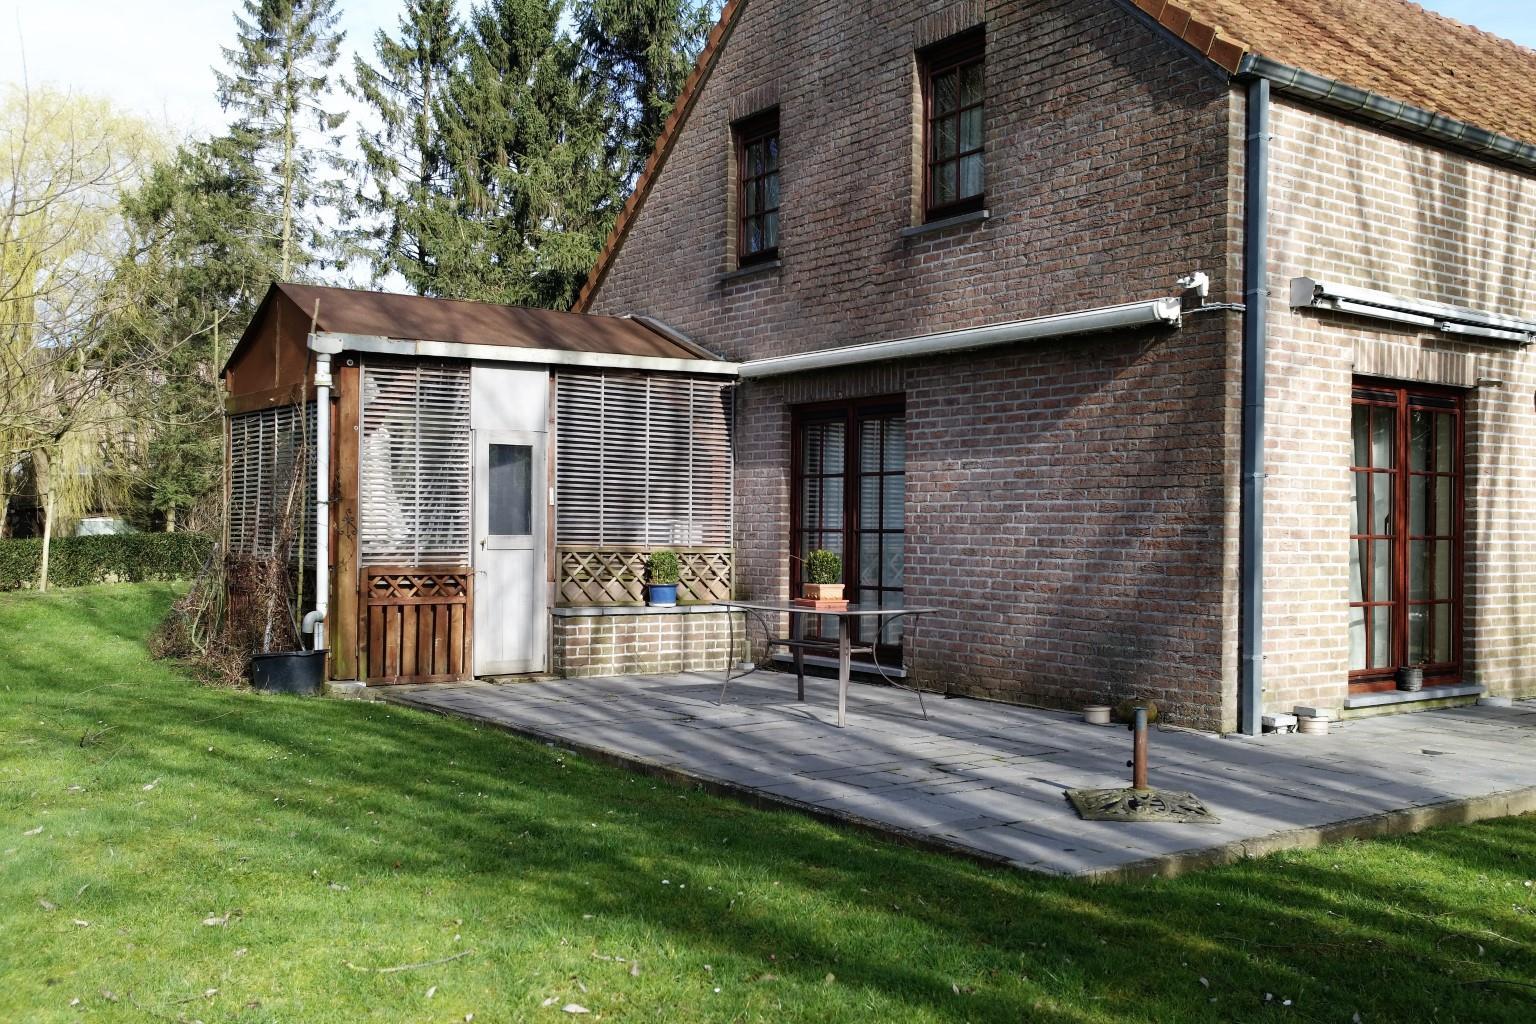 Villa - Braine-le-Comte Petit-Roeulxlez-Braine - #3029346-11